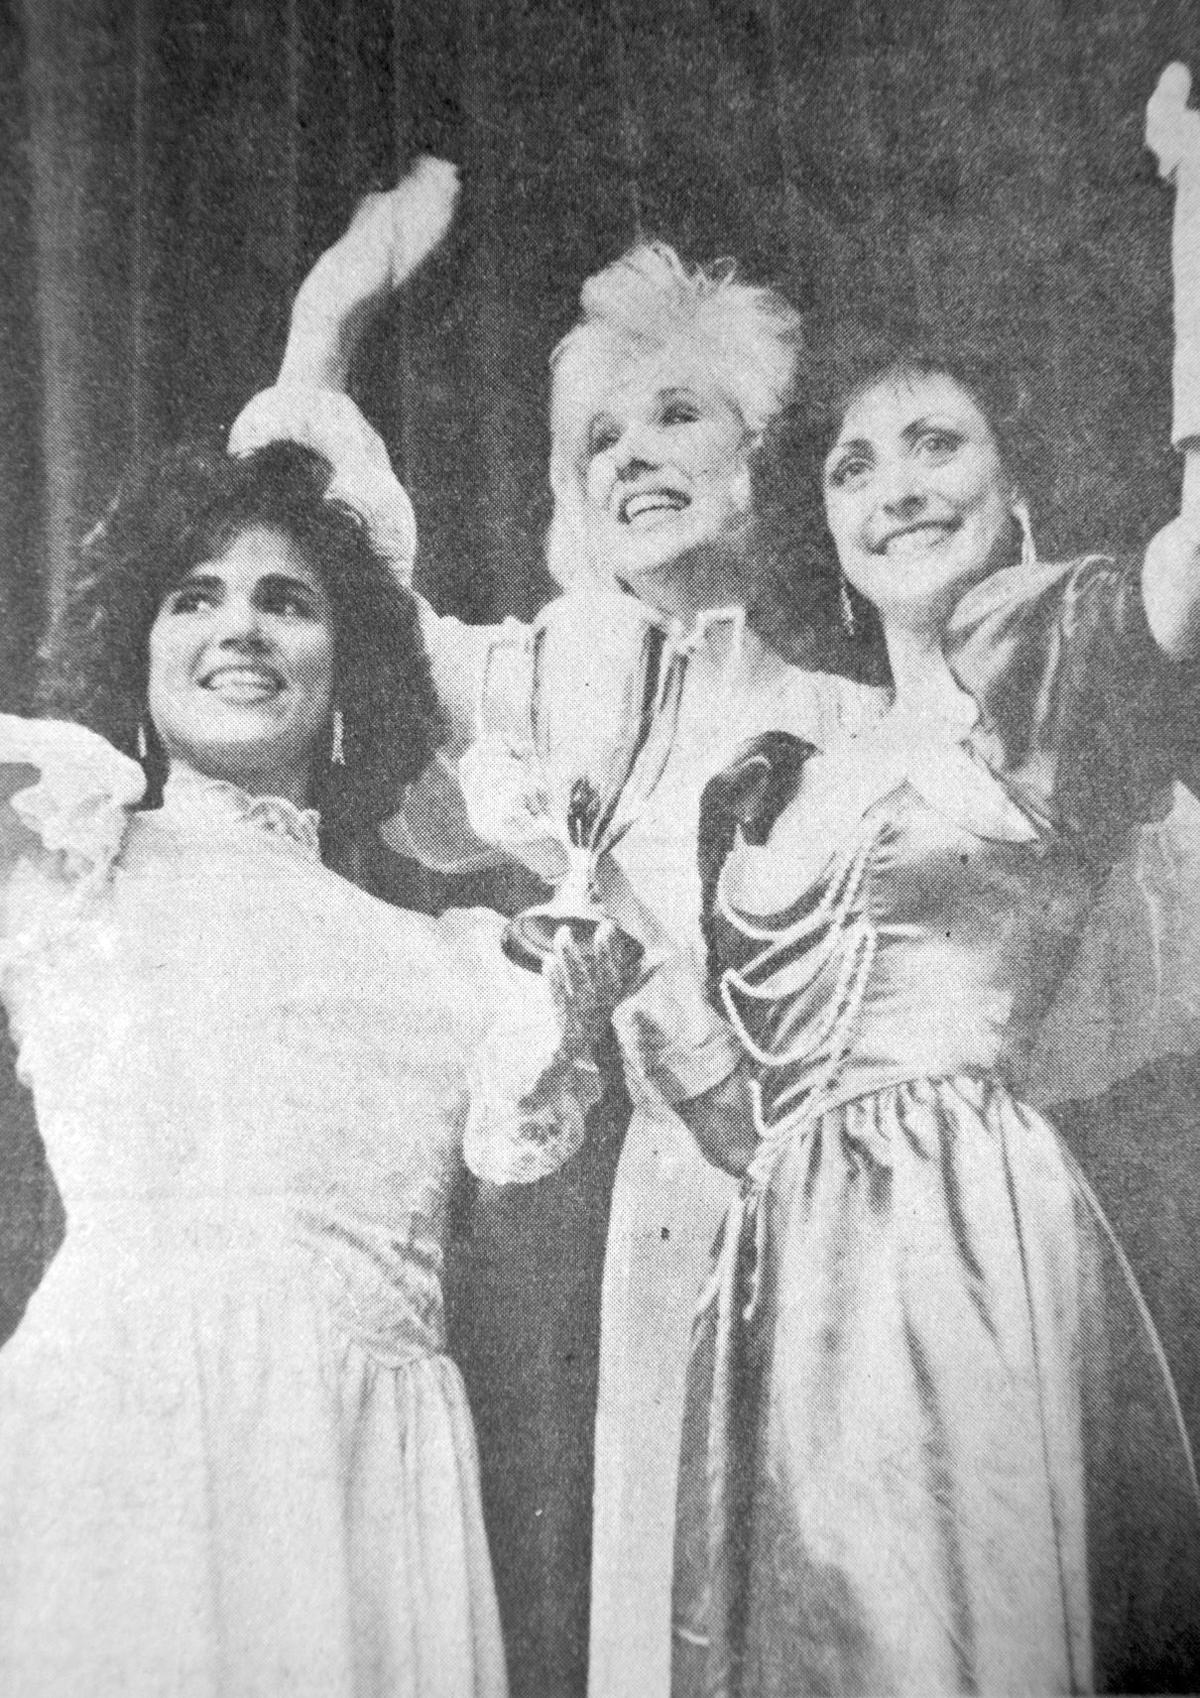 Julianne Griffin, Alison Briner, Sheri Cowart